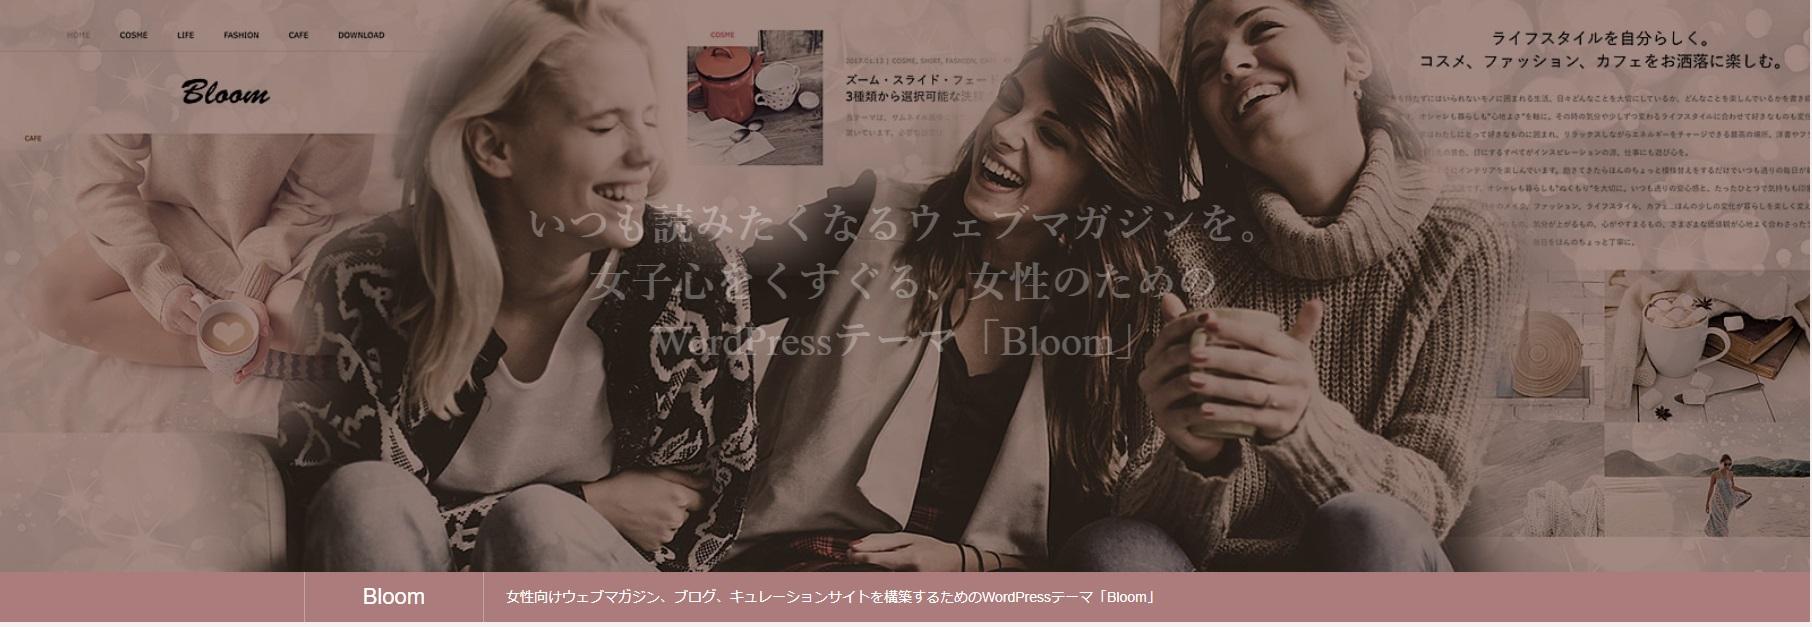 WordPressテーマ「Bloom」TCD053の評判・評価・口コミ【有料日本語ワードプレステンプレート】